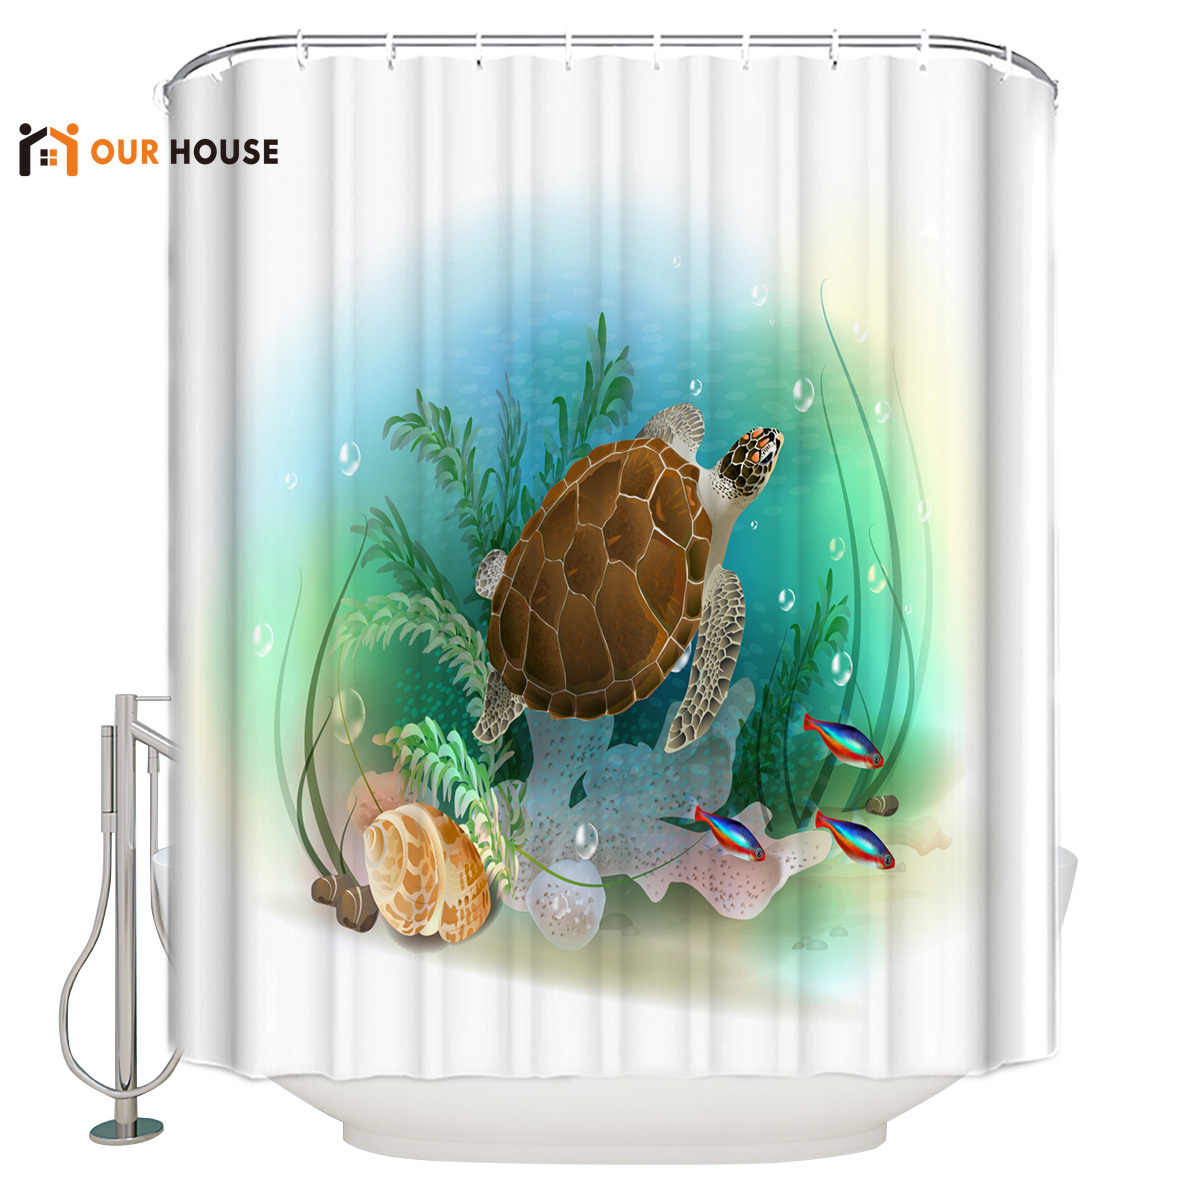 Ourhouse Undersea Animal Sea Turtle Shellfish Coral Fish Shower Curtain Fabric Bathroom Liner Childrens Modern Cloth Hotel Cu Shower Curtains Aliexpress